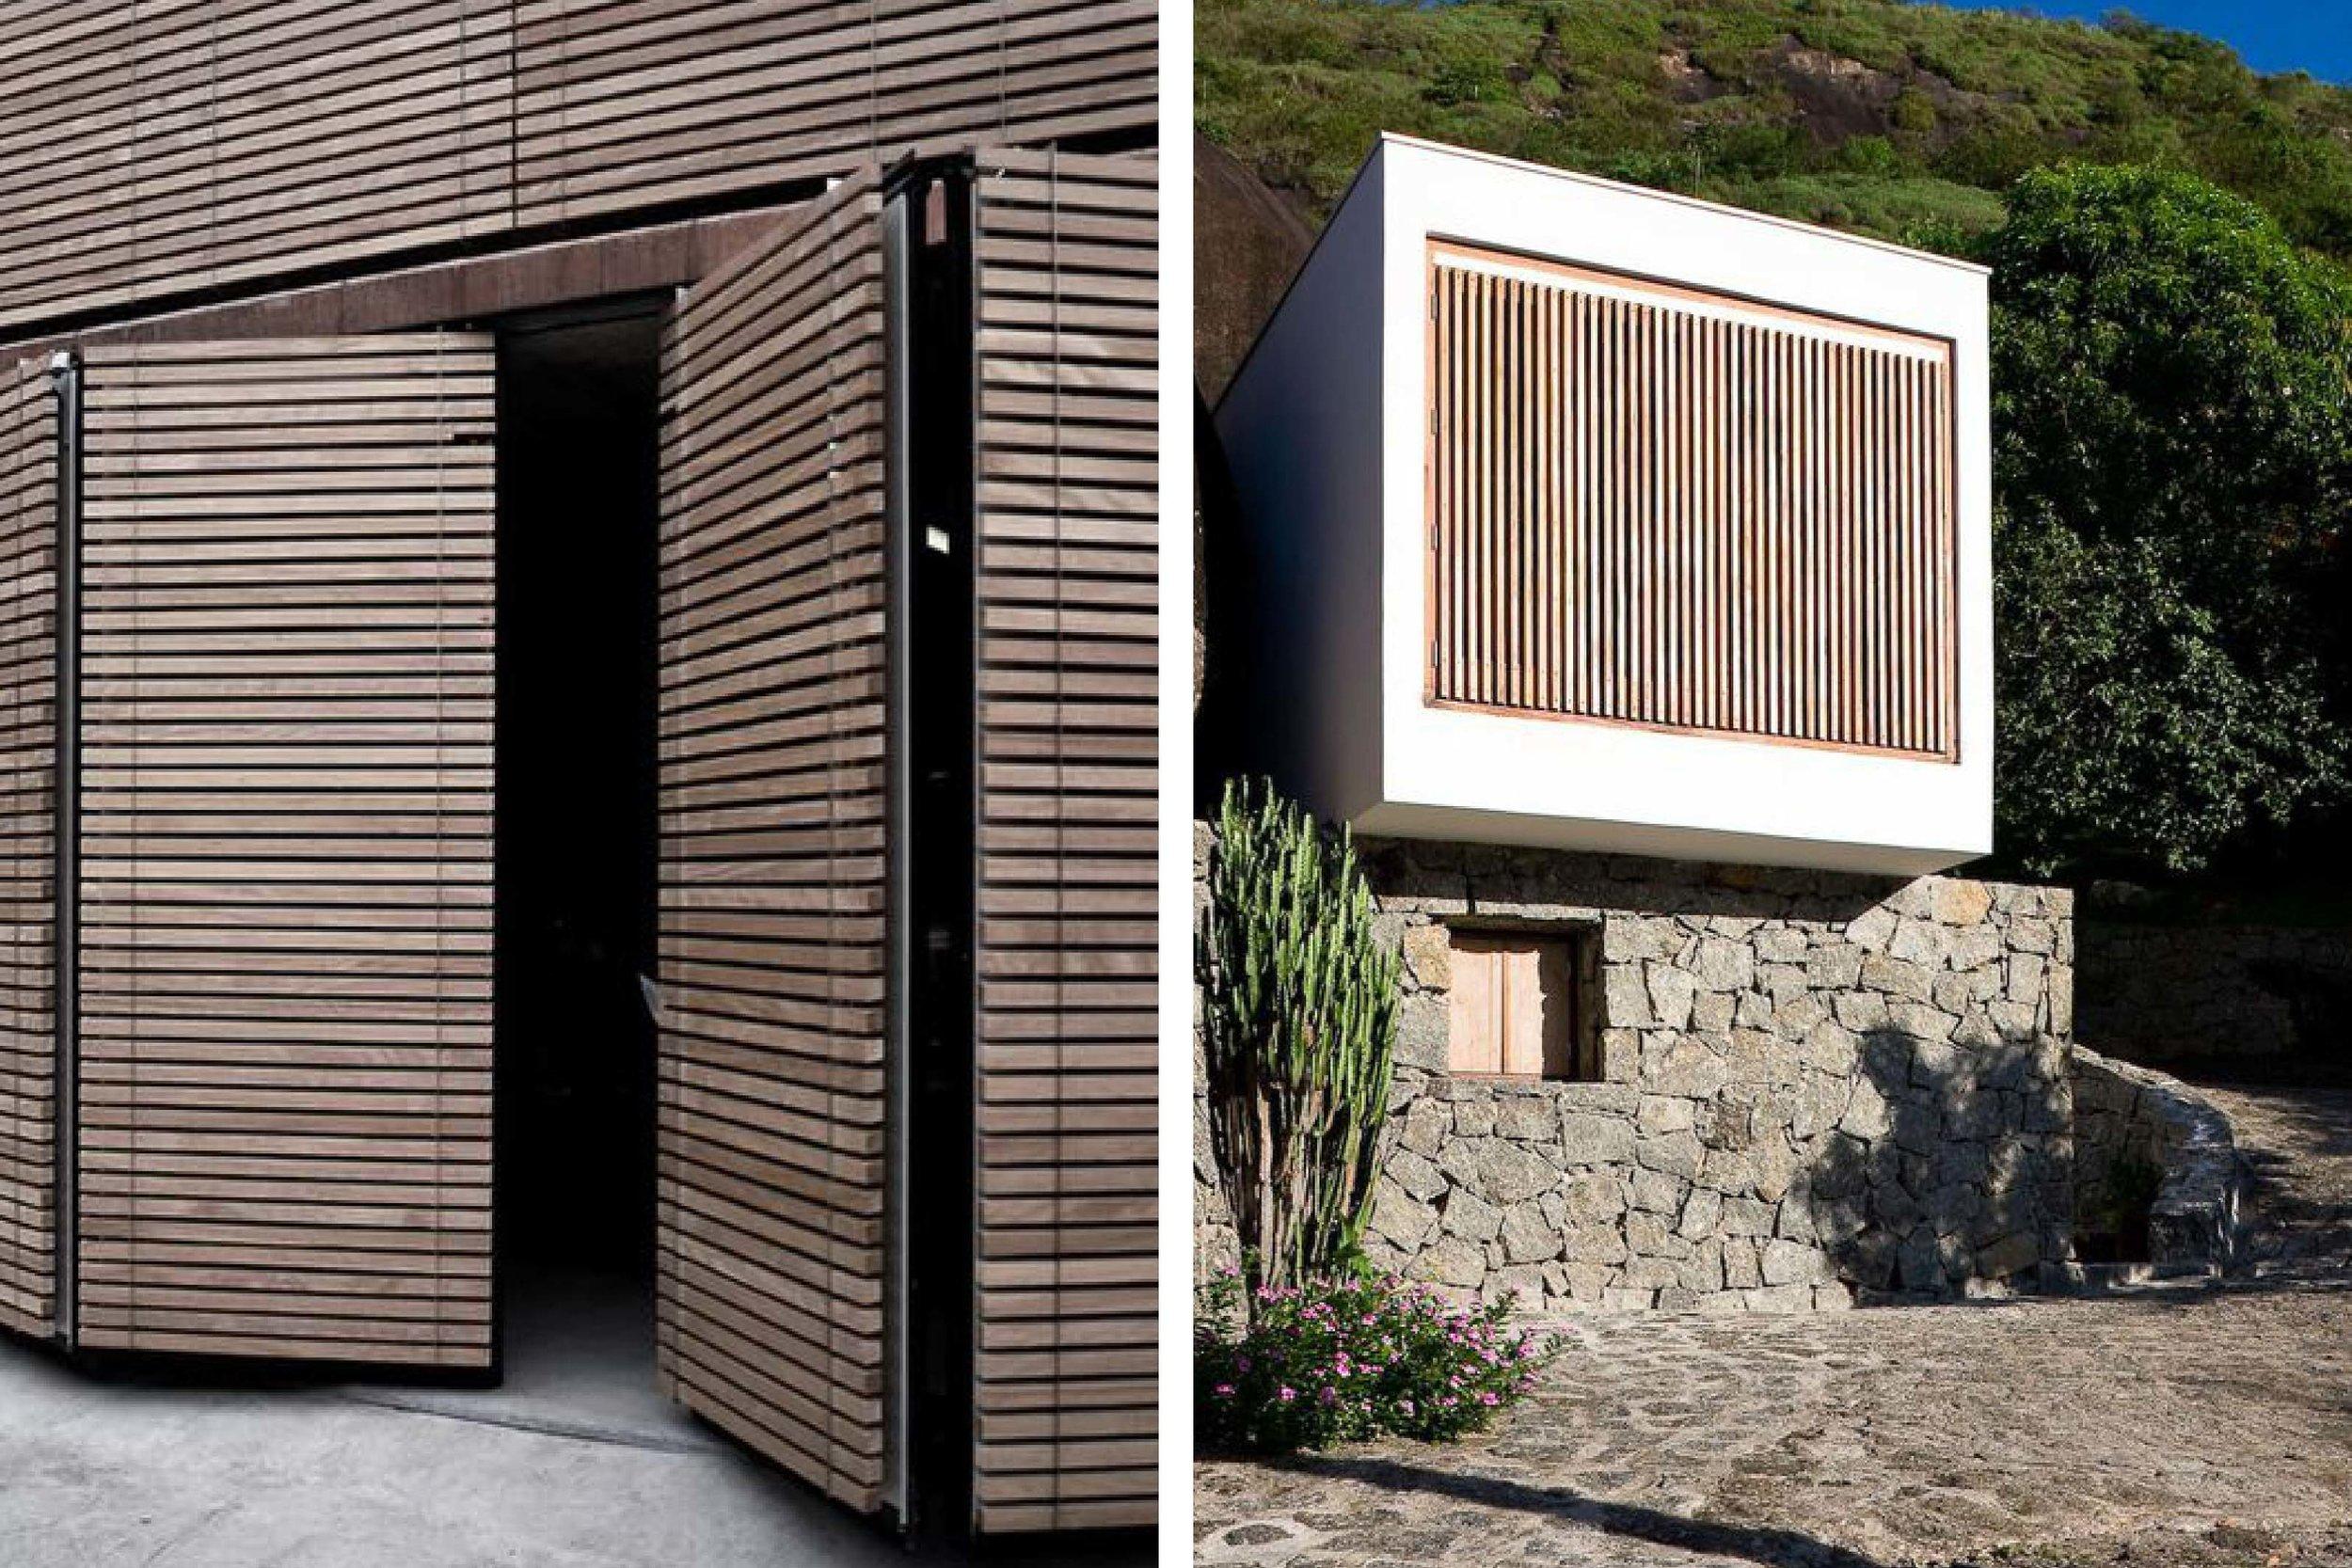 Contemporary design. Wooden materials.